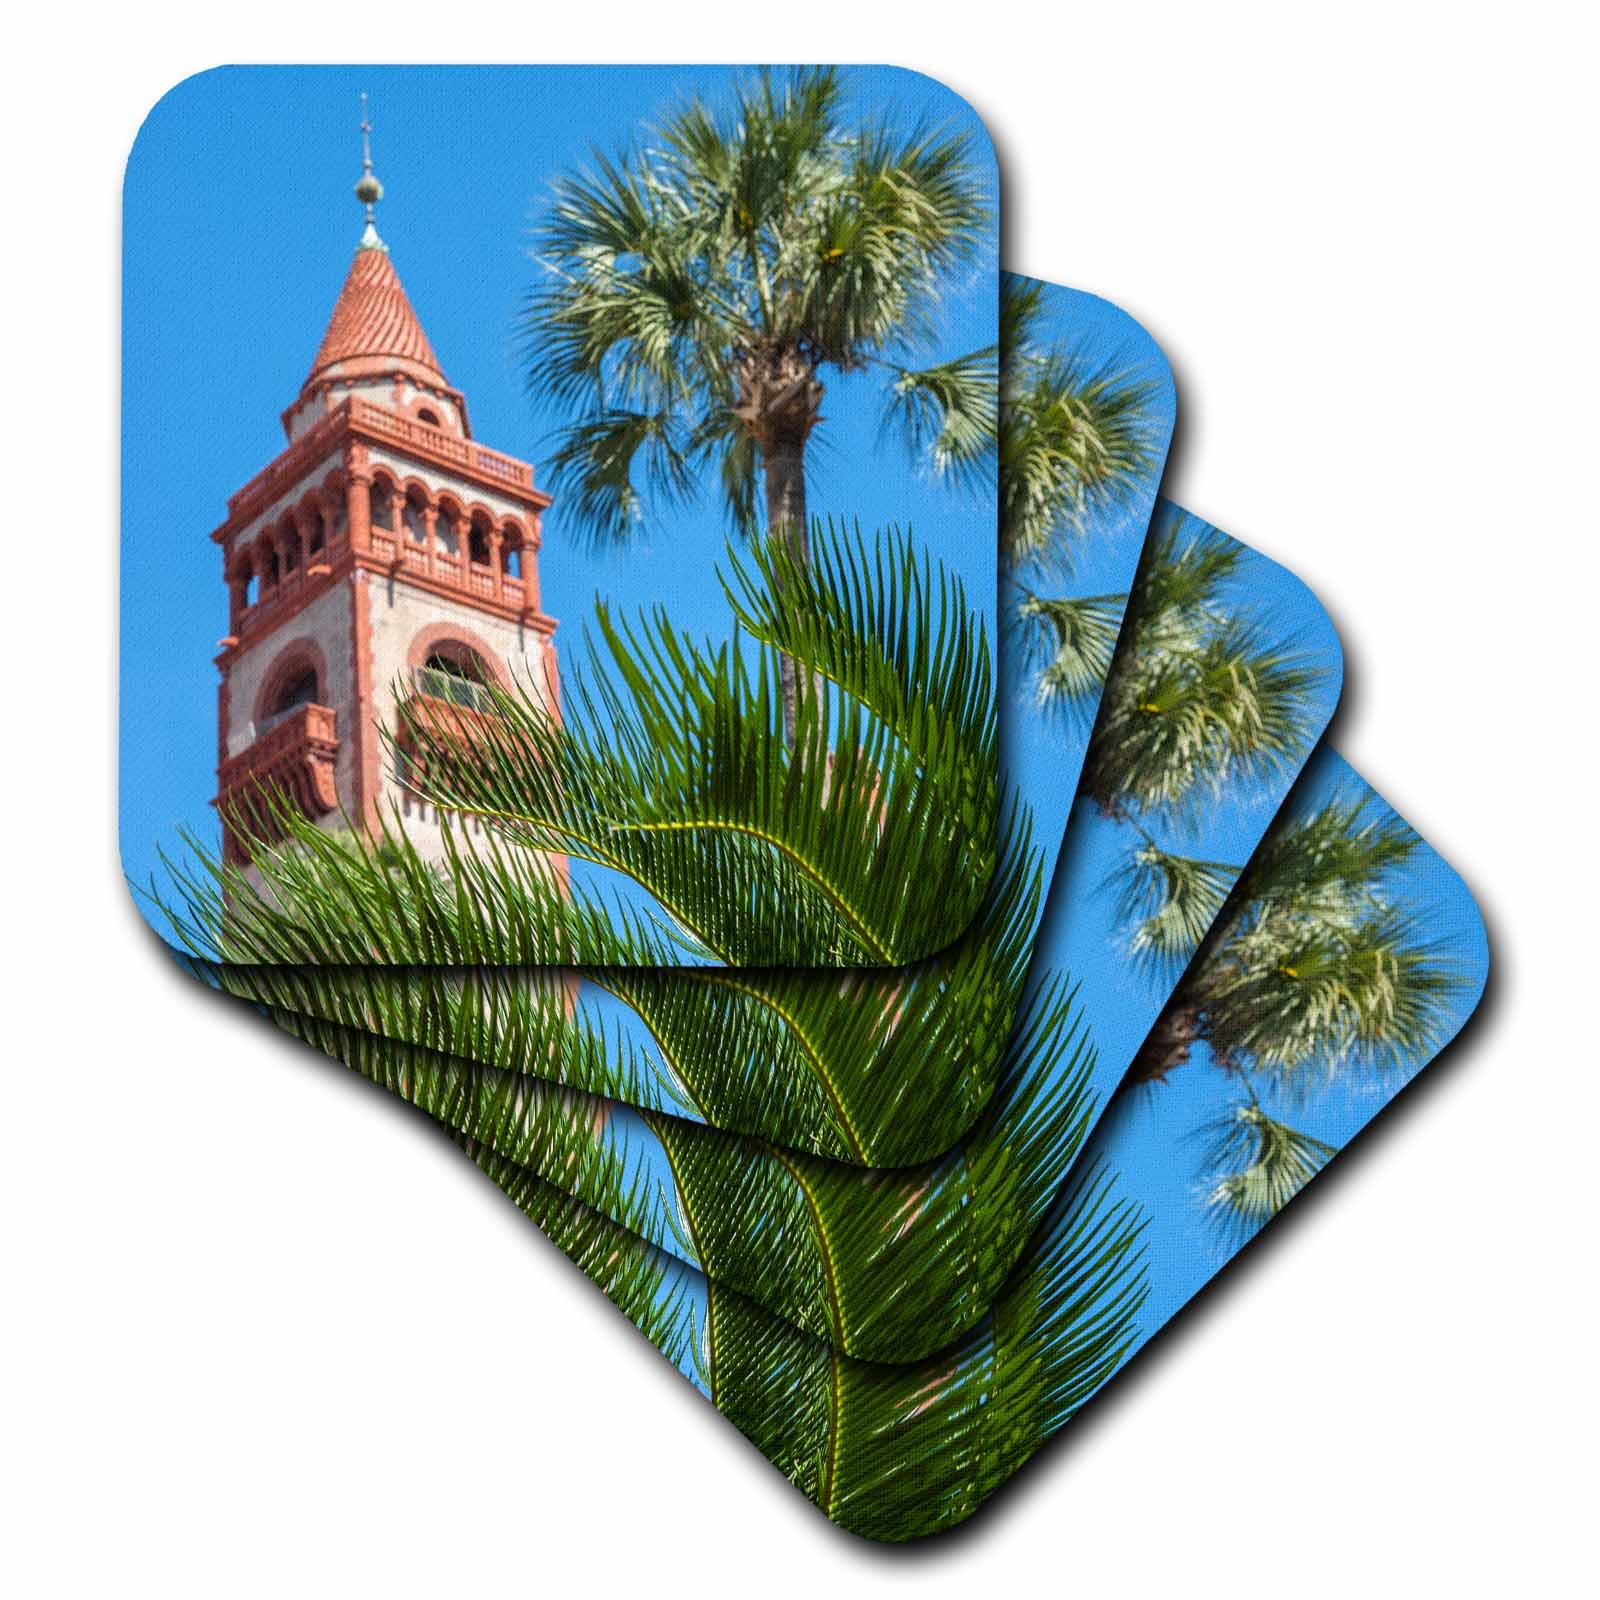 3dRose cst_209703_1 USA, Florida, St Augustine, Hotel Ponce De Leon, Flagler College Soft Coasters (Set of 4)